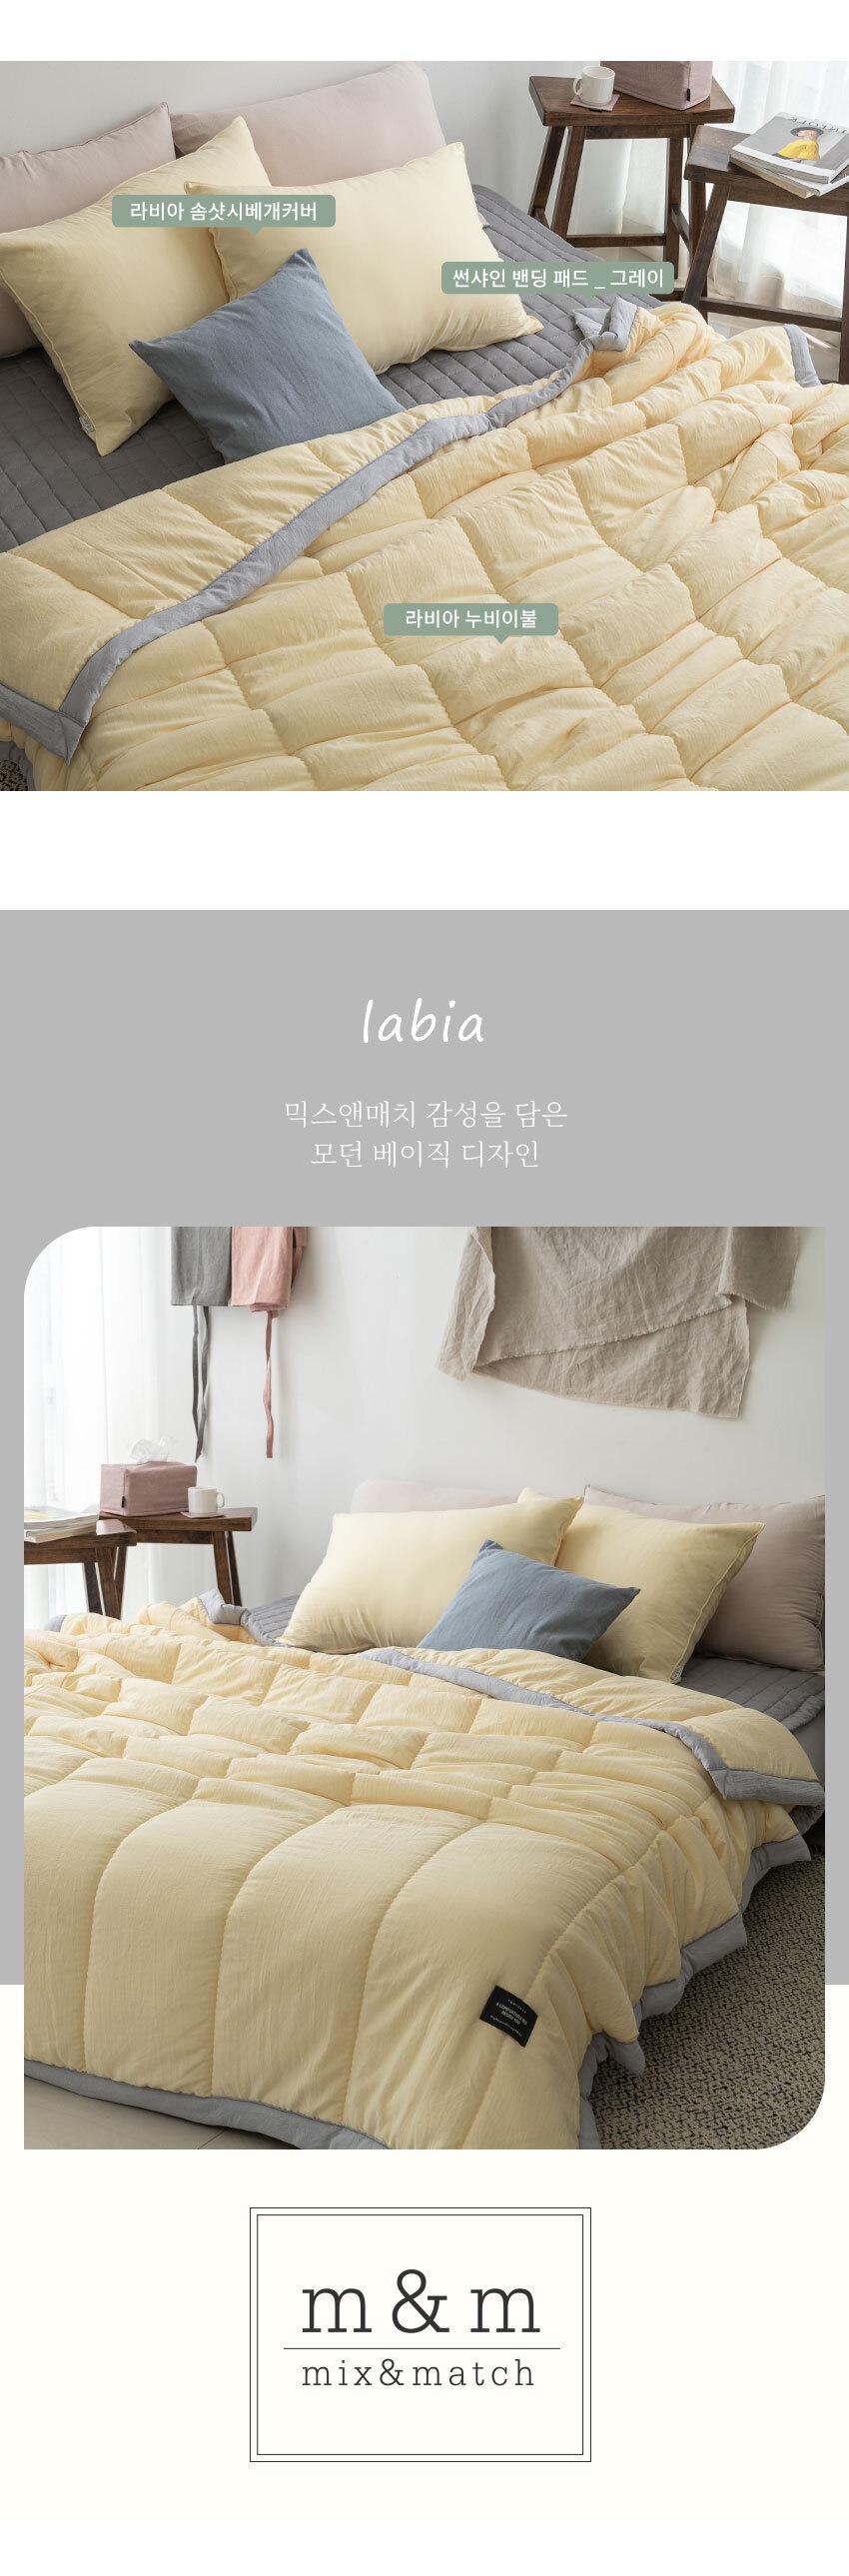 labia_bed_bottom.jpg